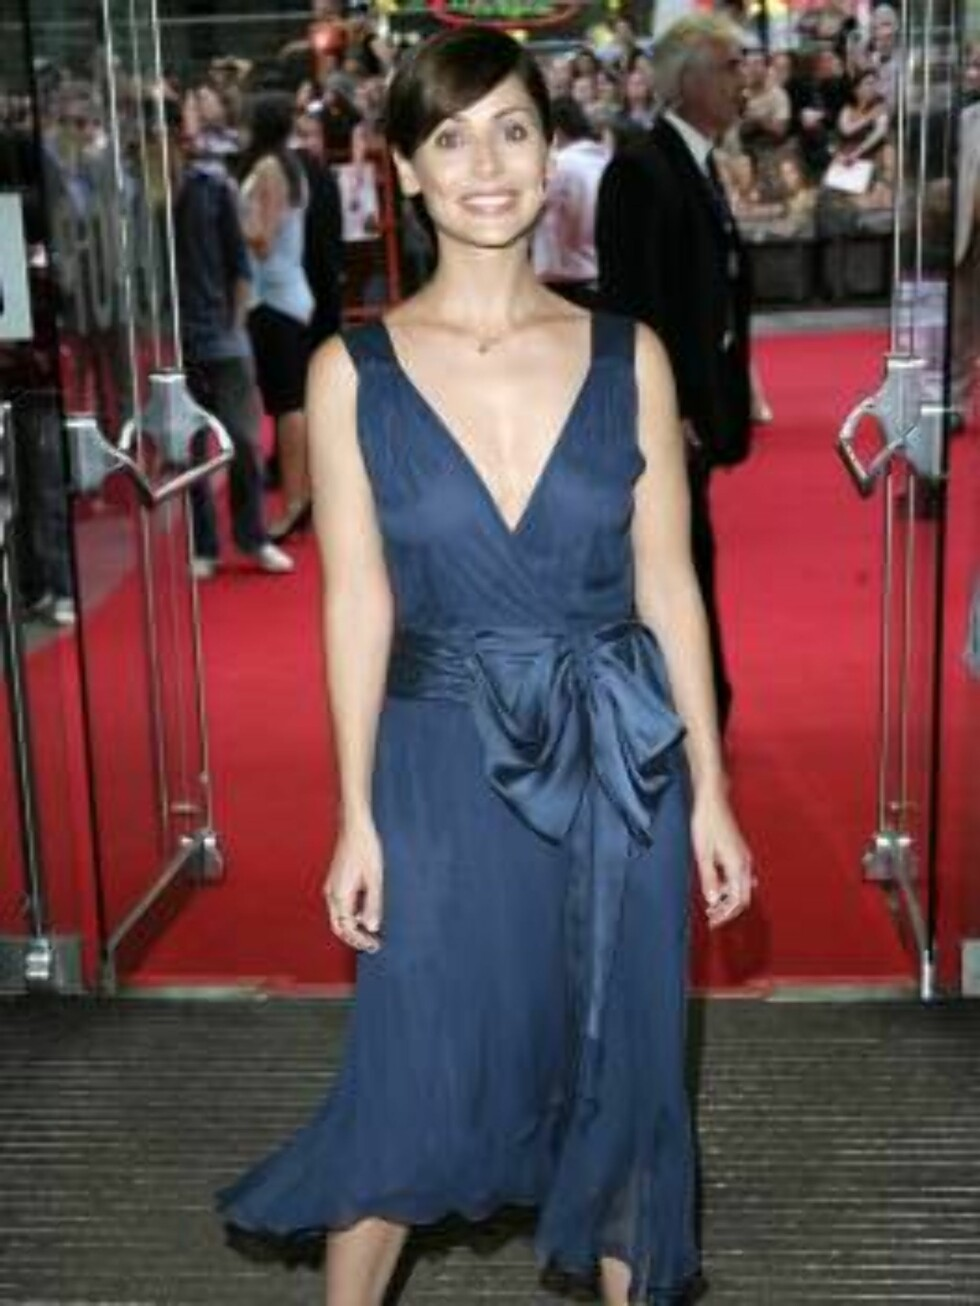 BLÅ DRØM: Pop-sangeren Natalie Imbruglia på vei til kino. Foto: All Over Press